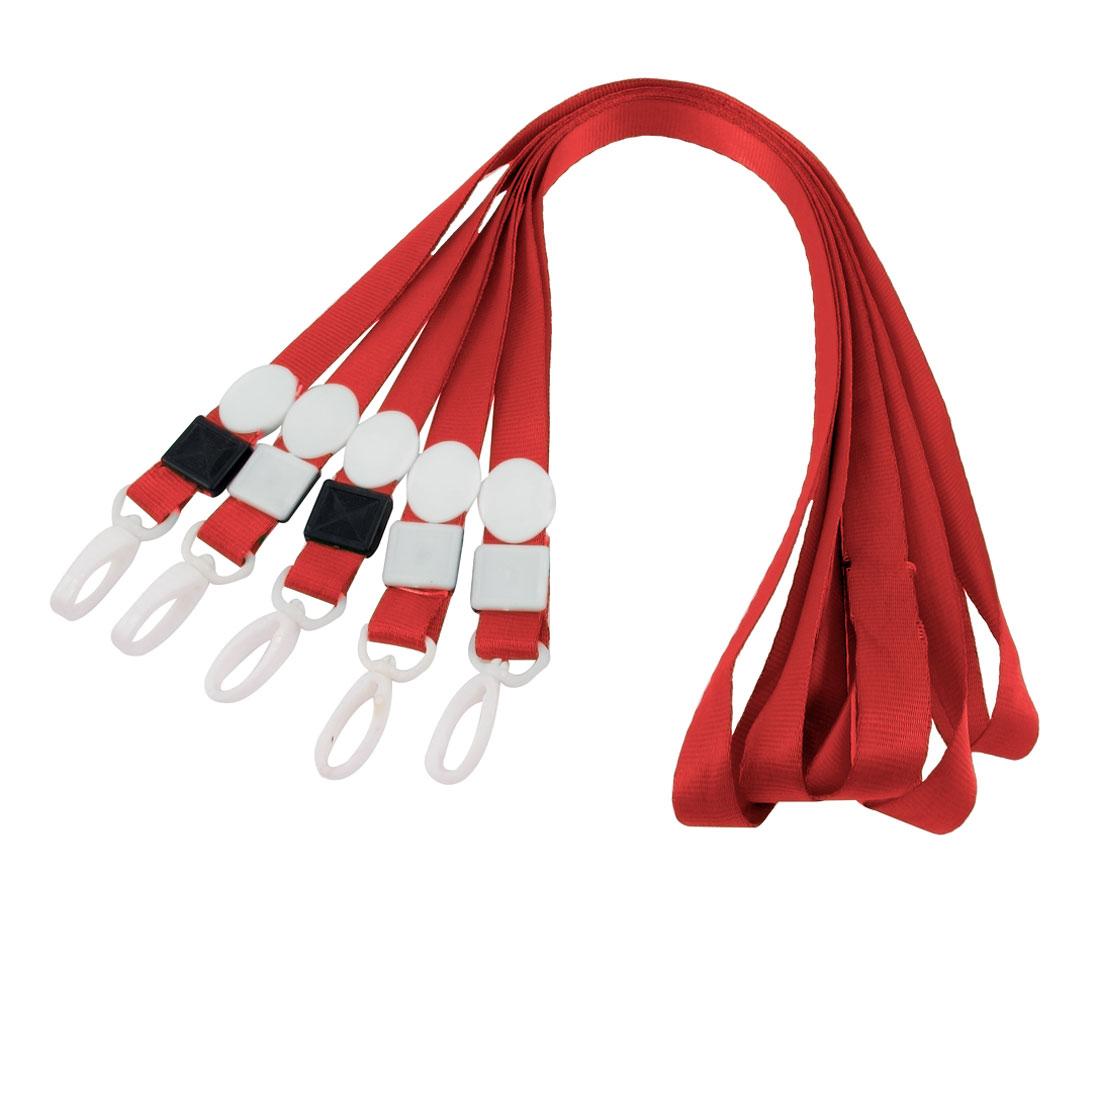 5pcs Swivel Clip ID Card Keys Badge Holder Lanyard Neck Strap Red 42cm Long